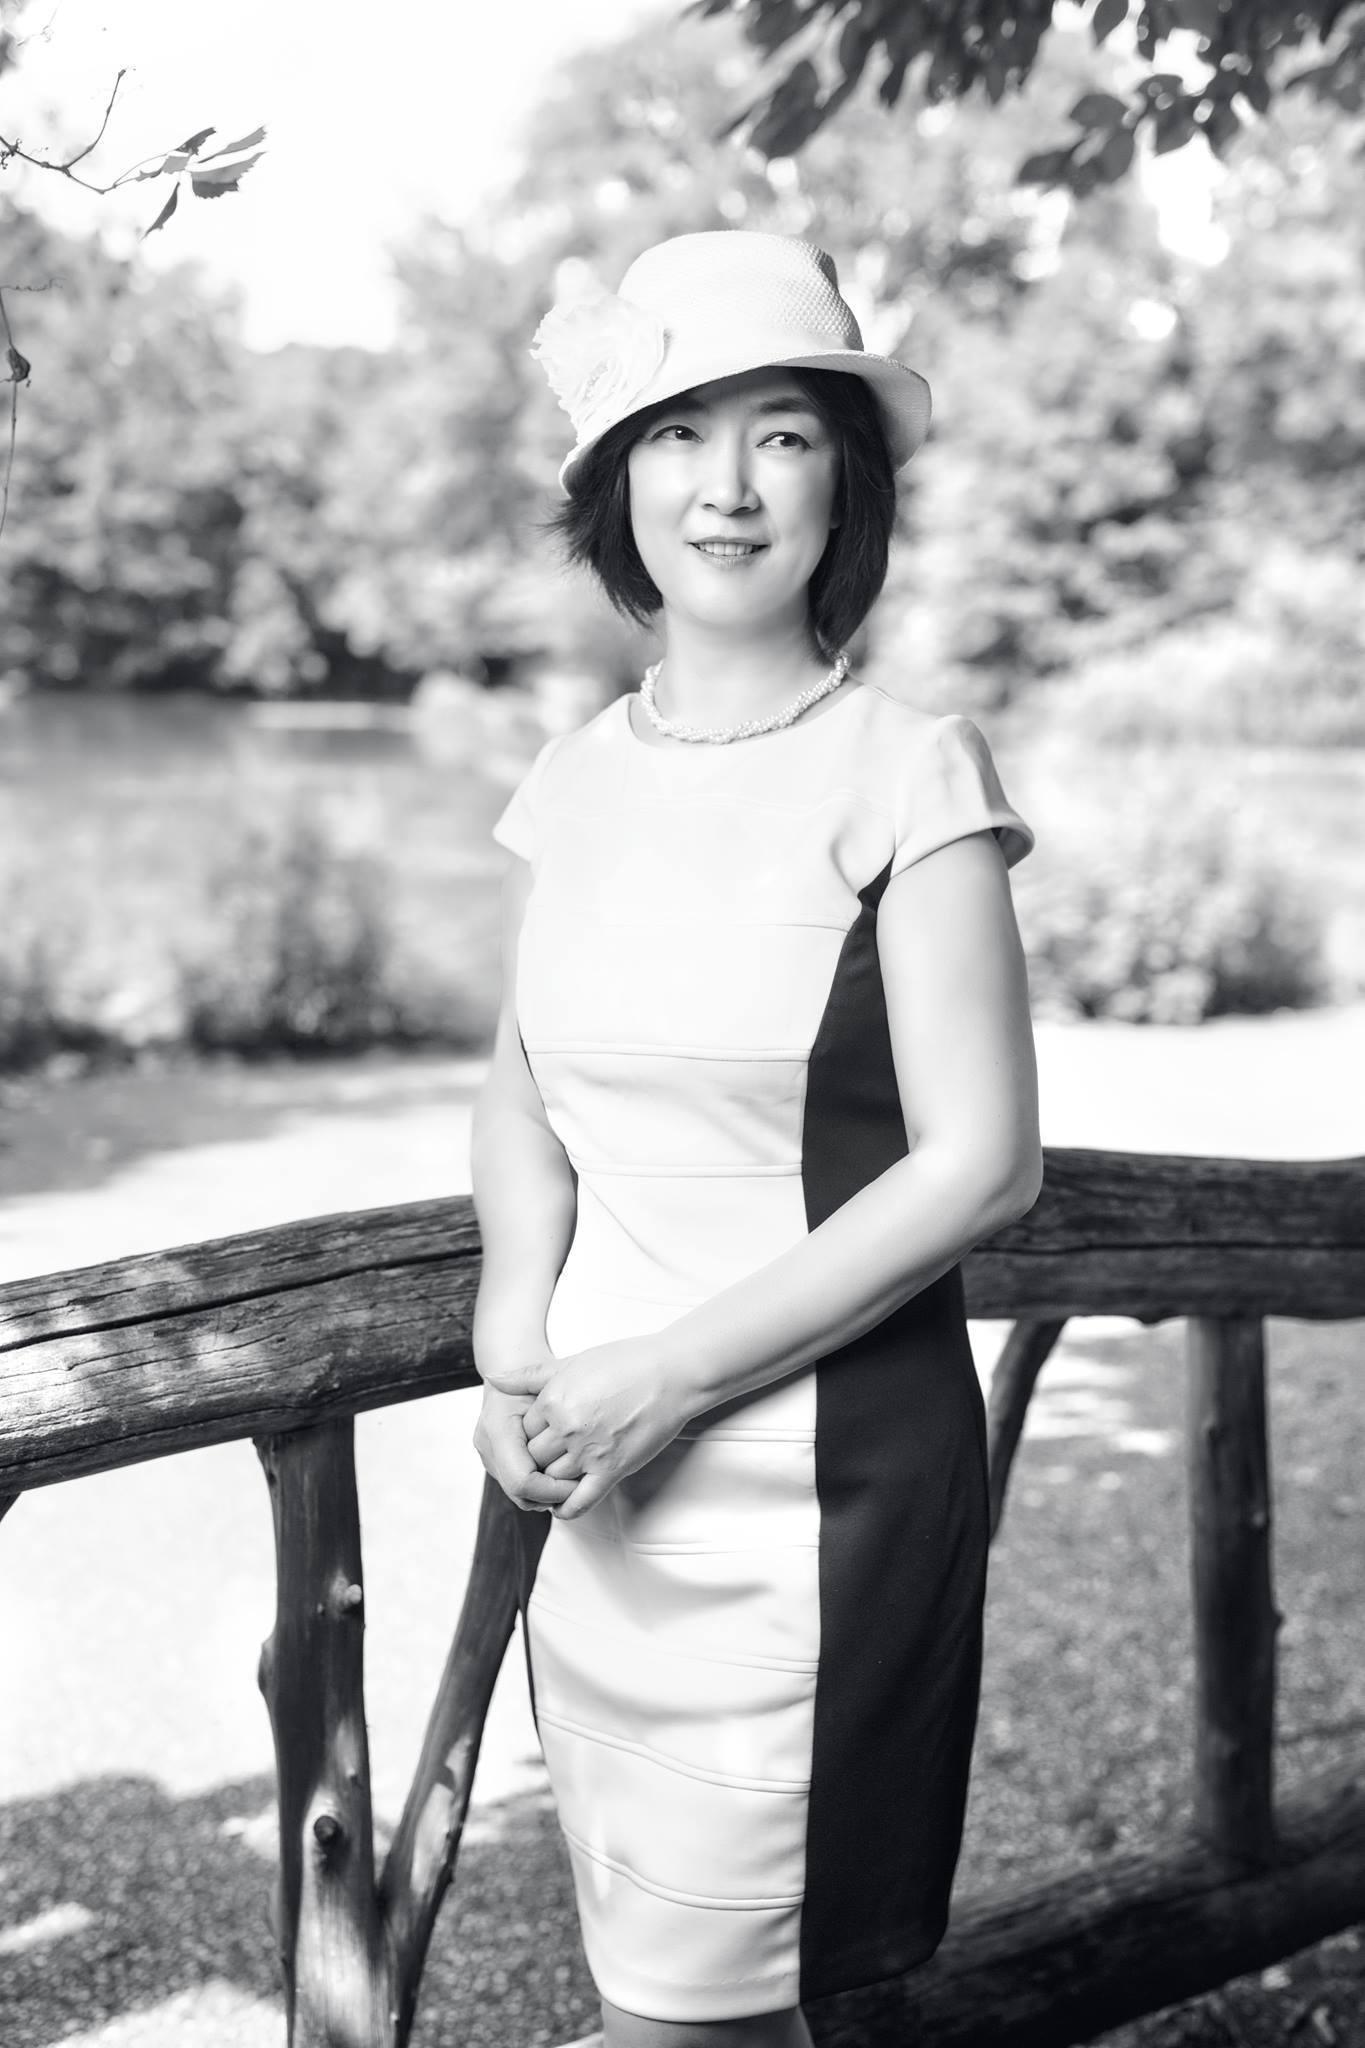 Jennifer at Prospect Park, on June 29, 2017 曾錚2017年6月29日攝於紐約展望公園(Prospect Park) Photo credit:Benny Zhang Studio 攝影:張炳乾